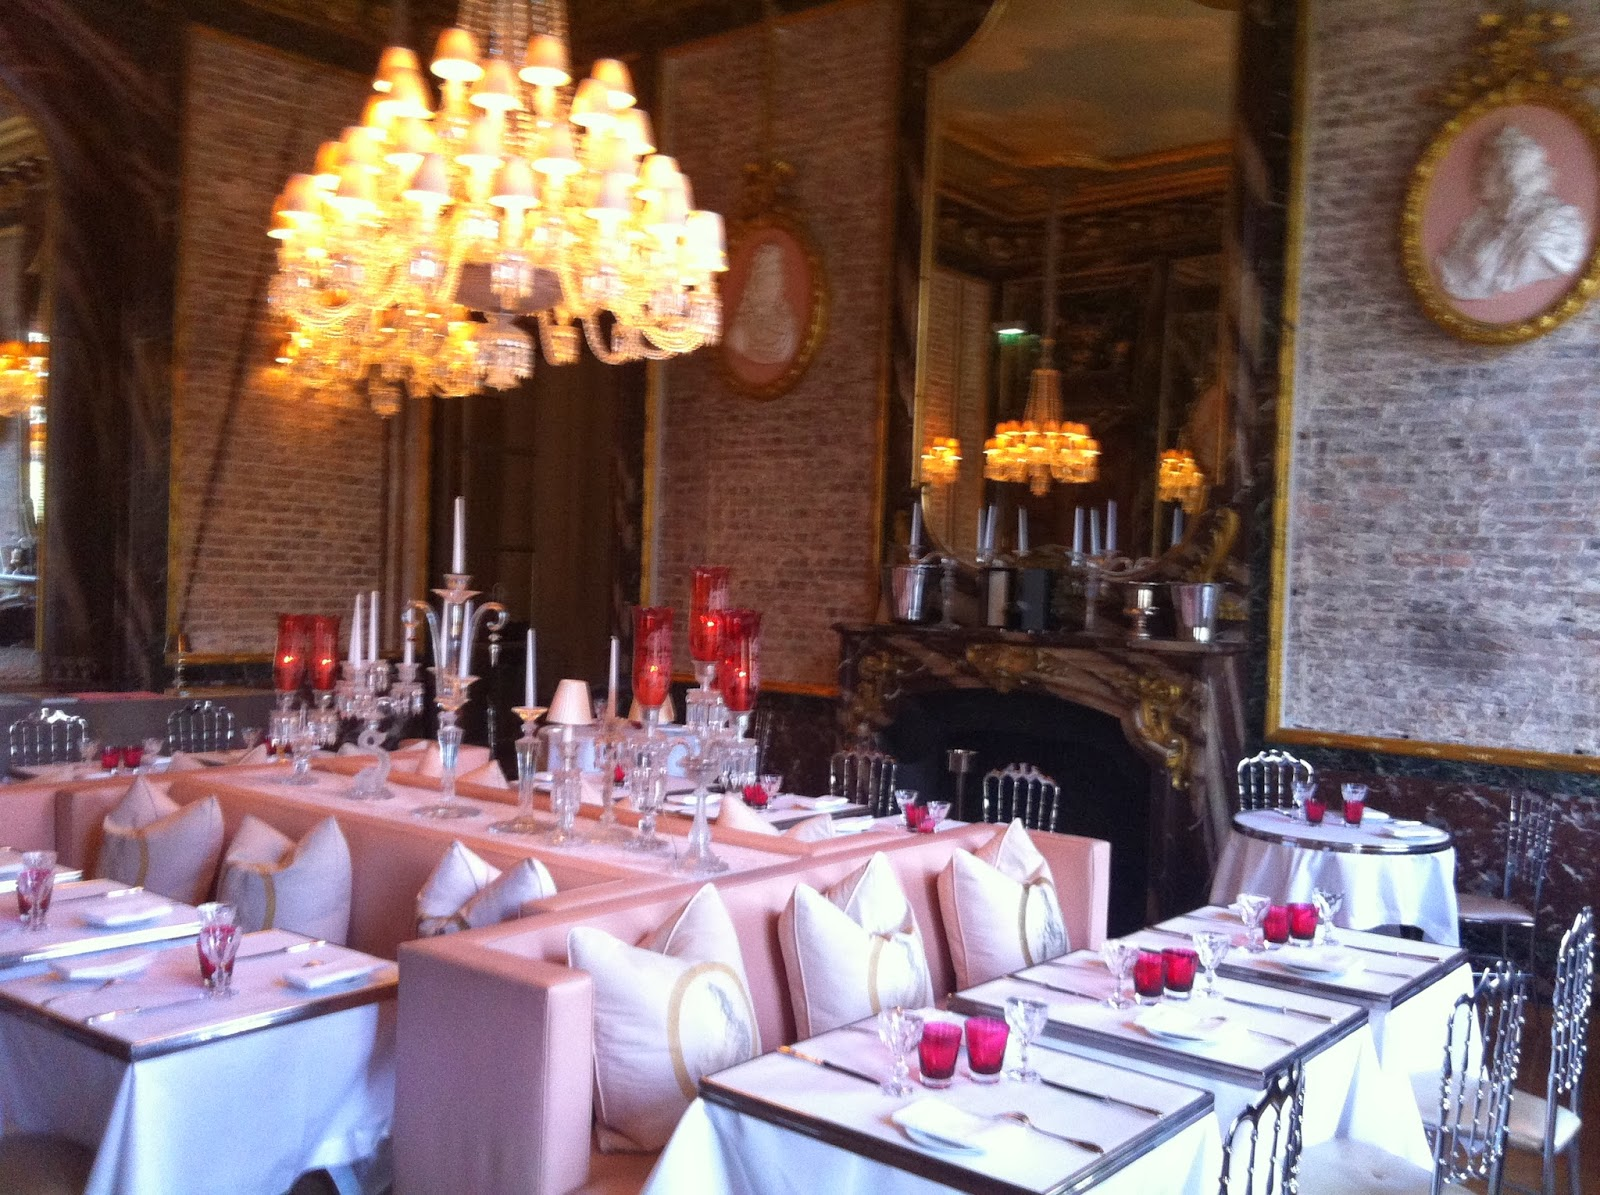 Cristal Room Baccarat Paris The Trendy Guide